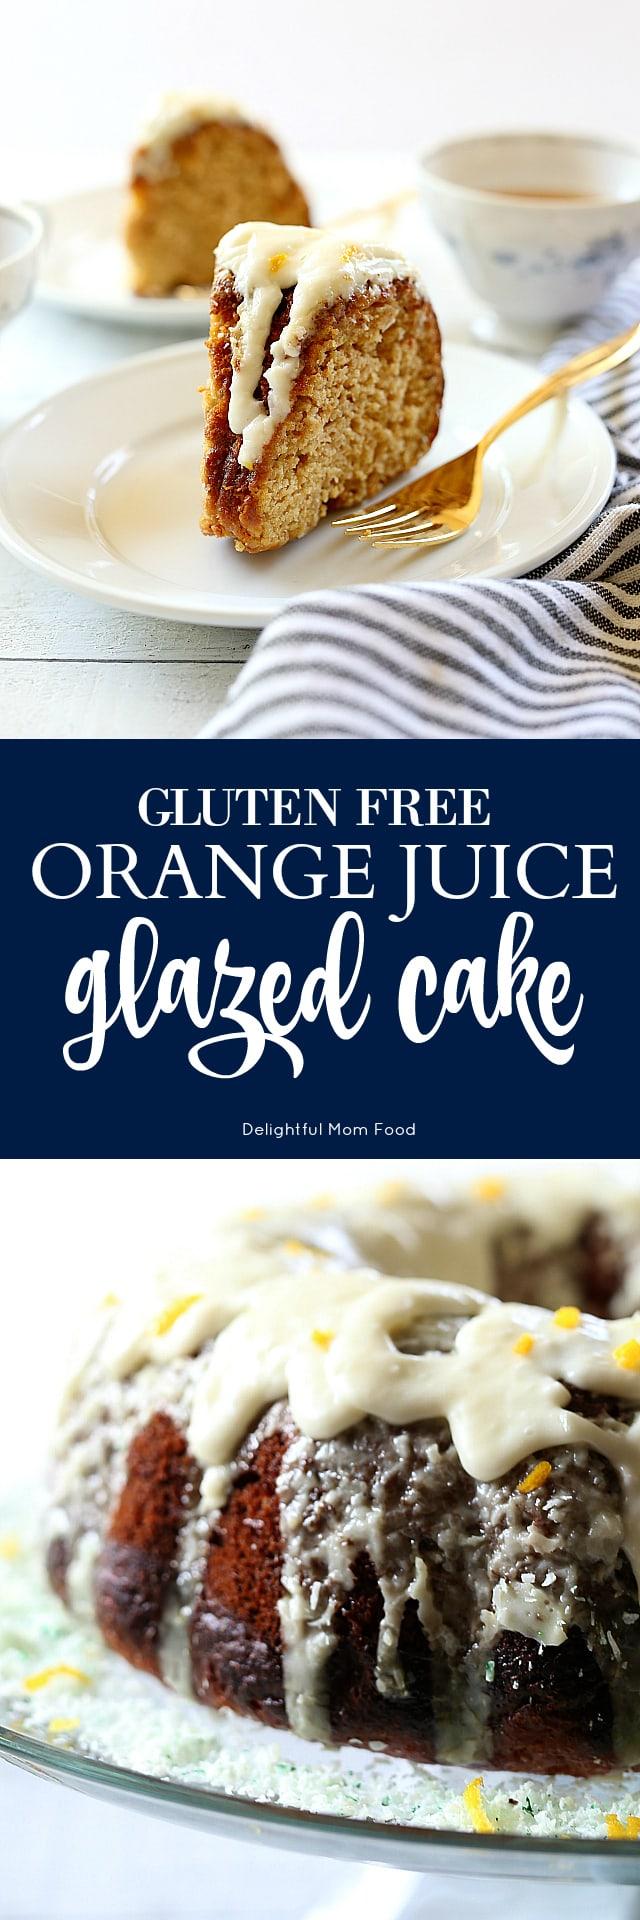 Gluten Free Orange Juice Glazed Cake Recipe